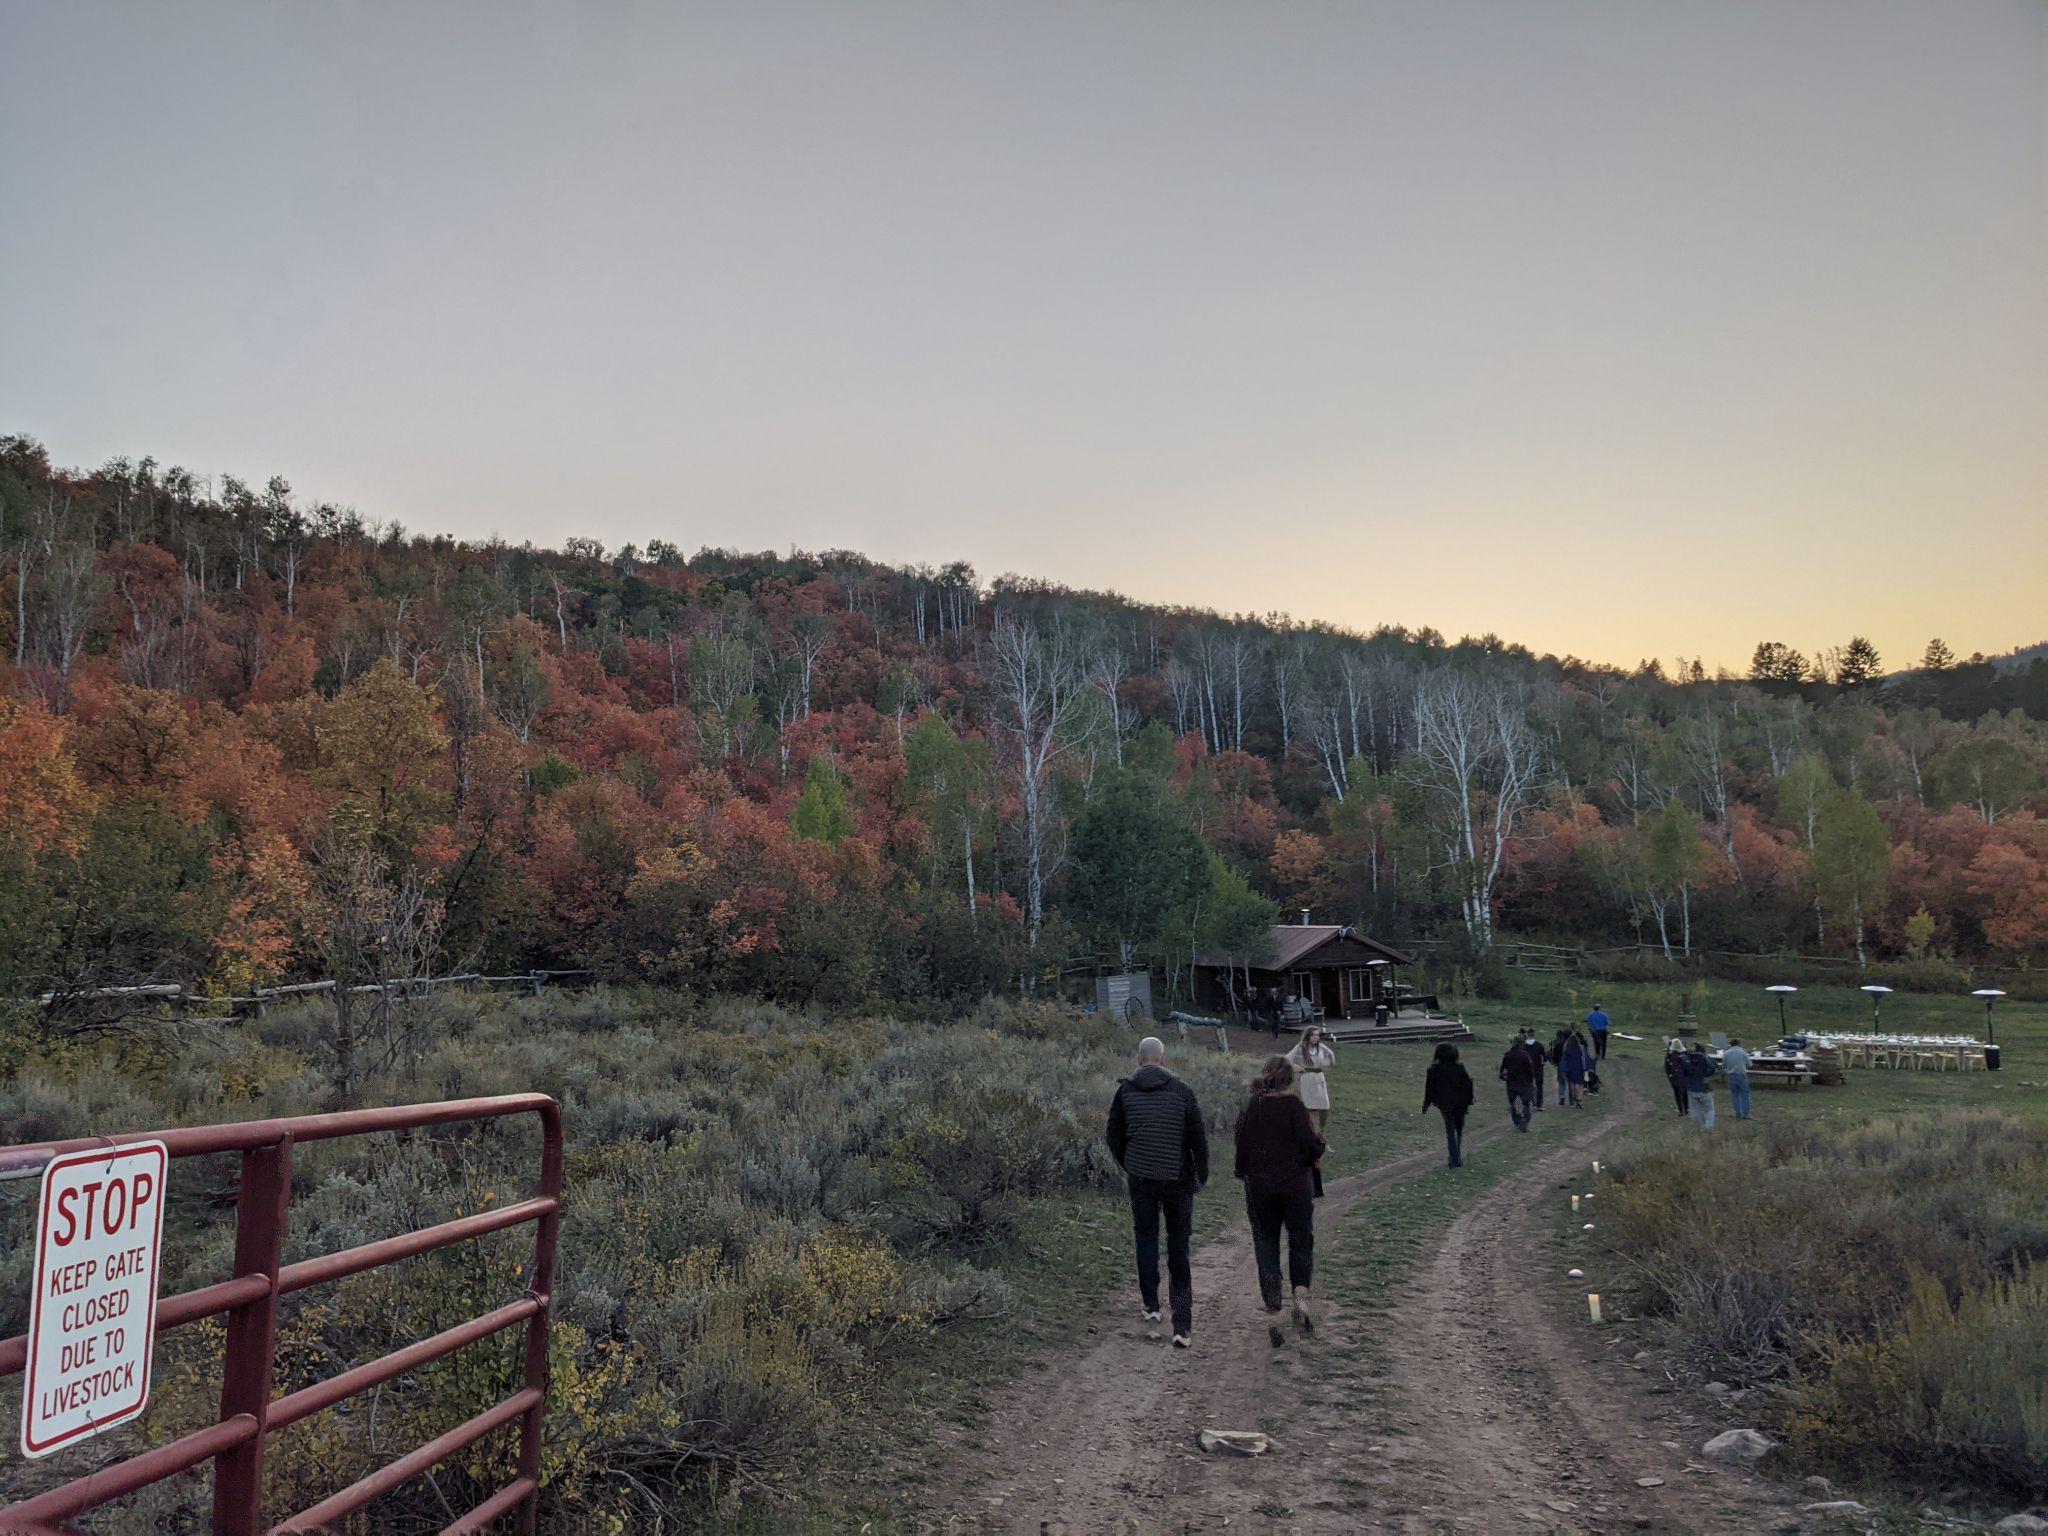 Group of people walking down a path in a field_Light_Flok